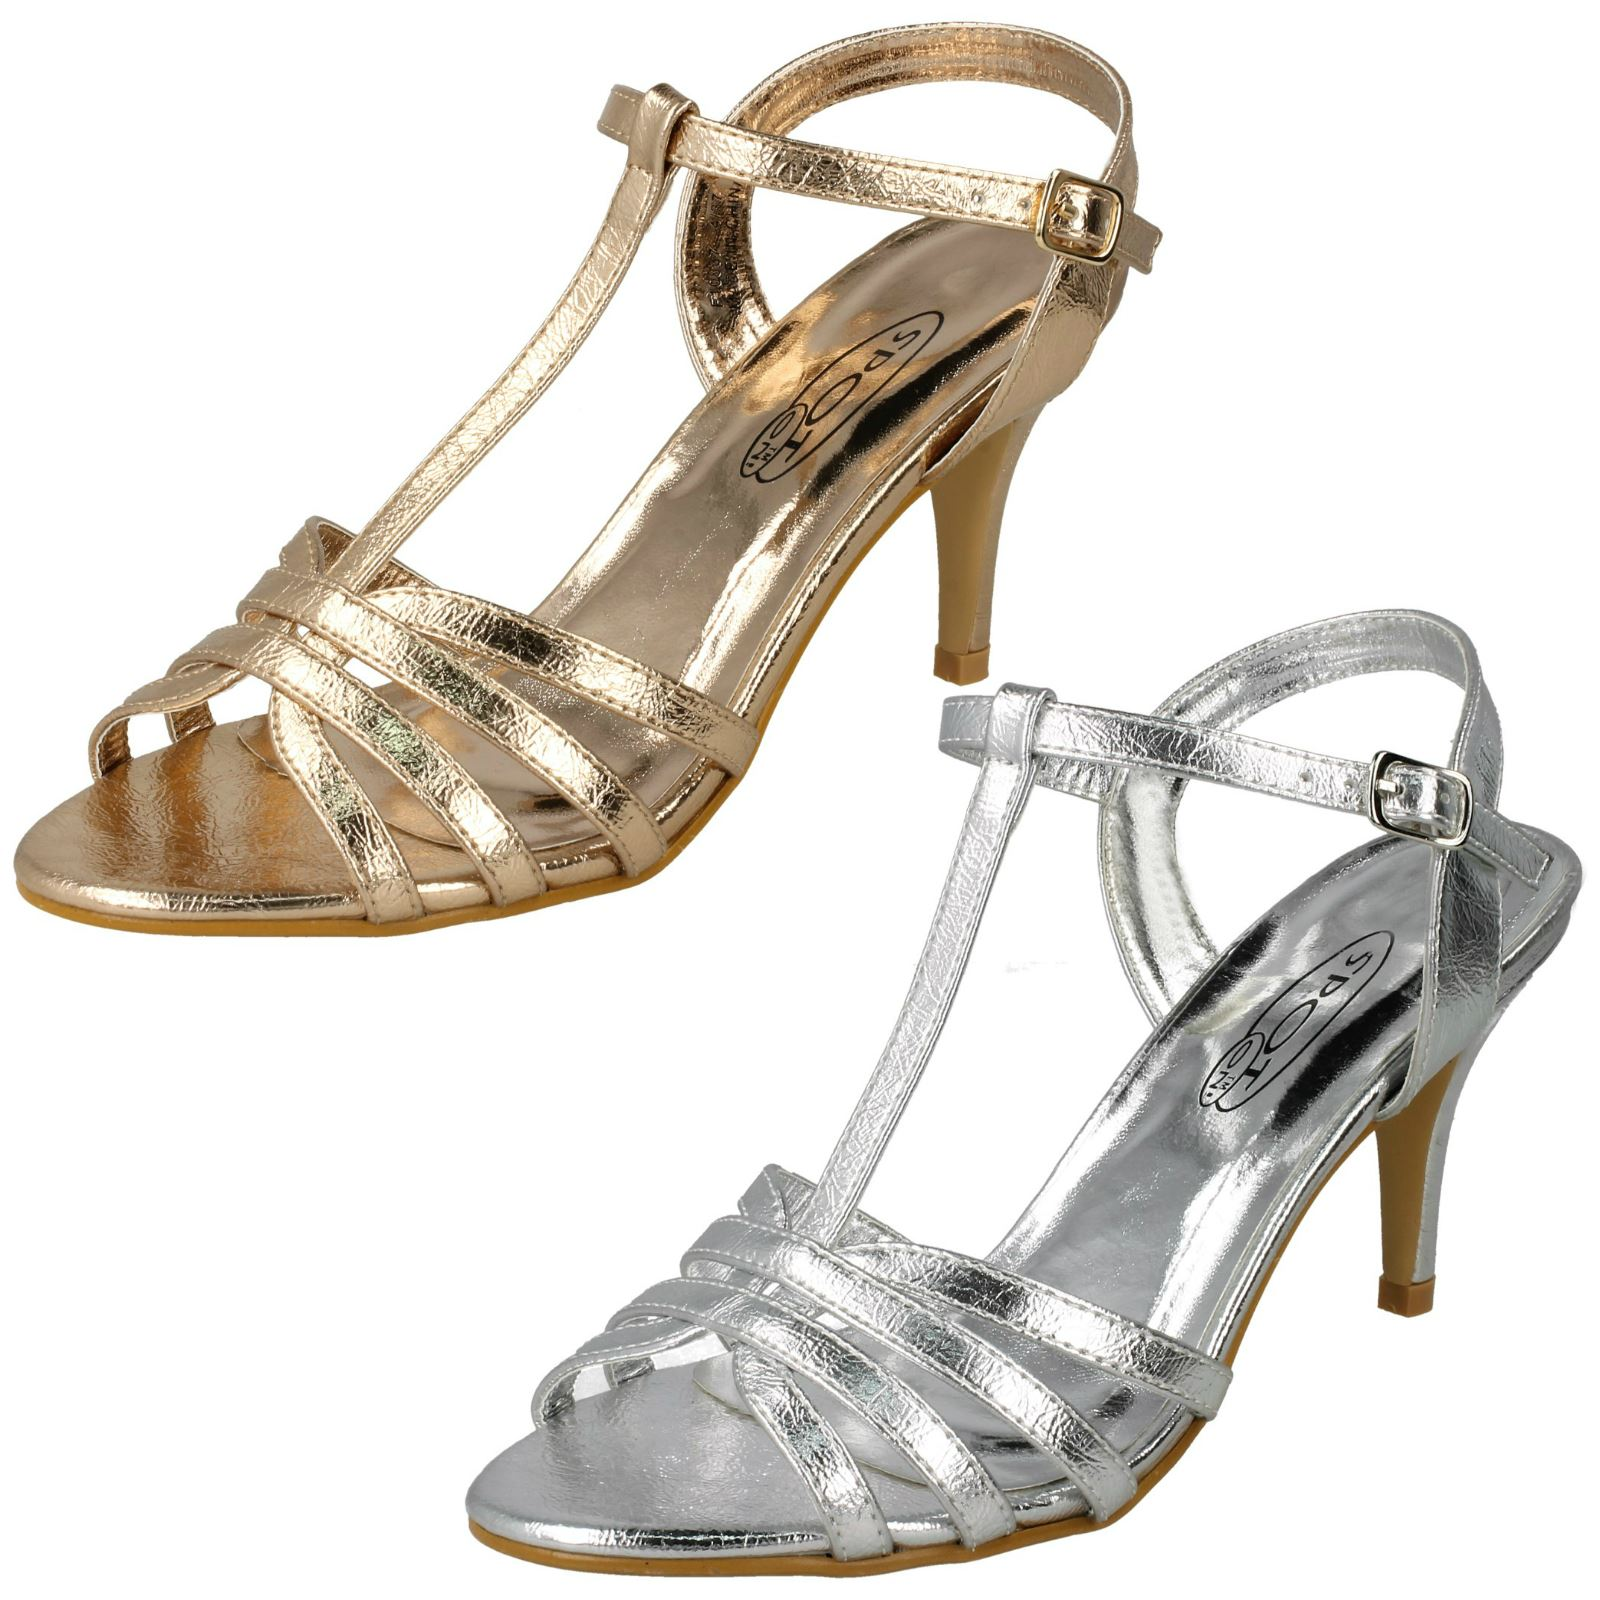 Fashion Sandali Scarpe da Donna Tacco Alto Sandali Pumps 9717 ARGENTO 39